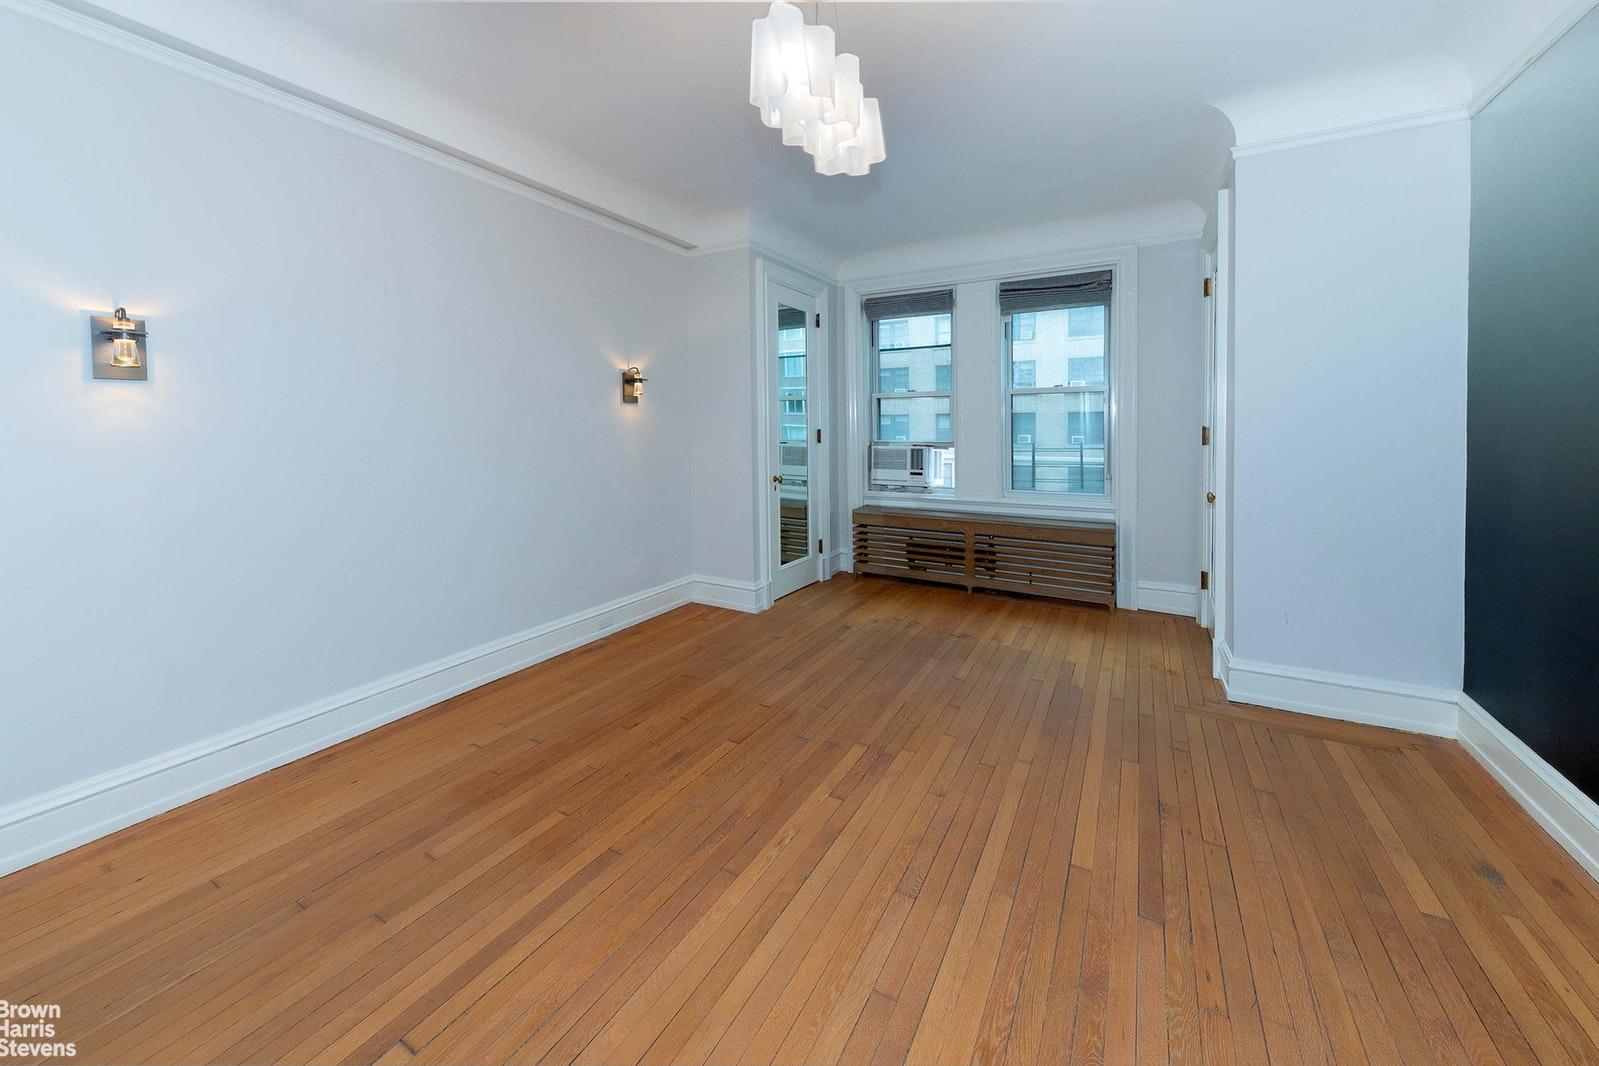 151 WEST 86TH STREET 4C, Upper West Side, $2,590,000, Web #: 20600512